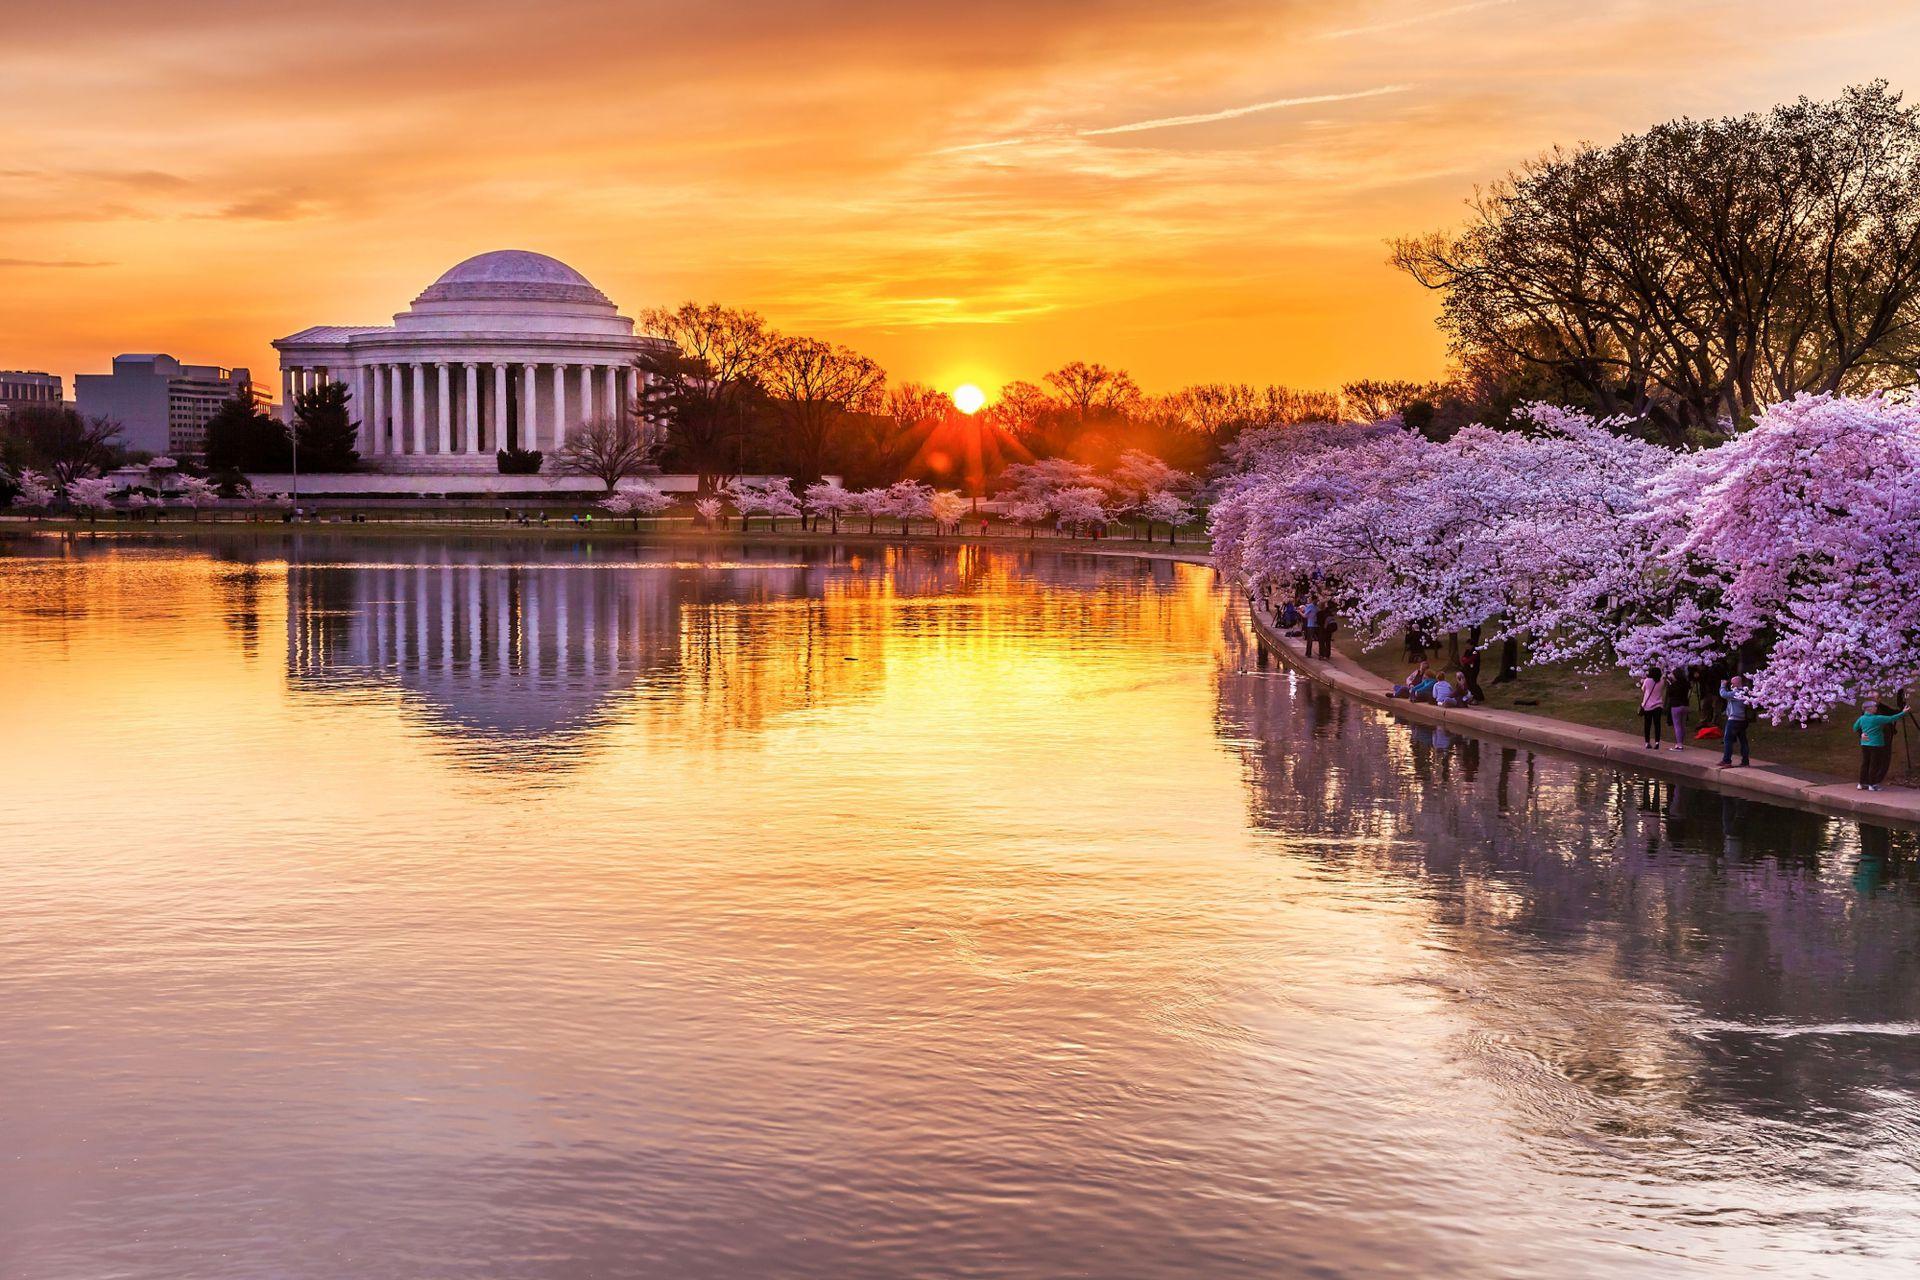 Cuenca Tidal con vista al monumento a Jefferson, Washington D.C.